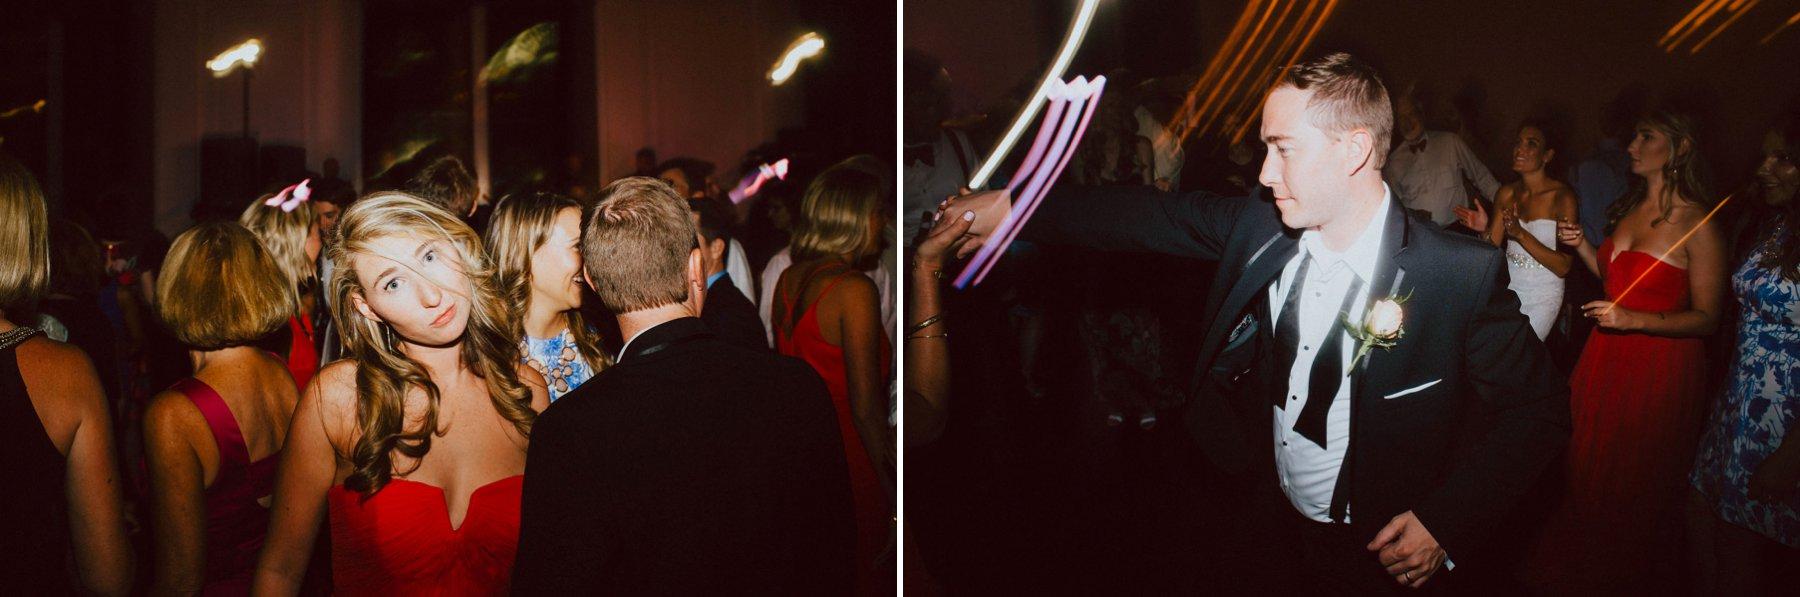 downtown-club-philadelphia-wedding-photographer-114.jpg